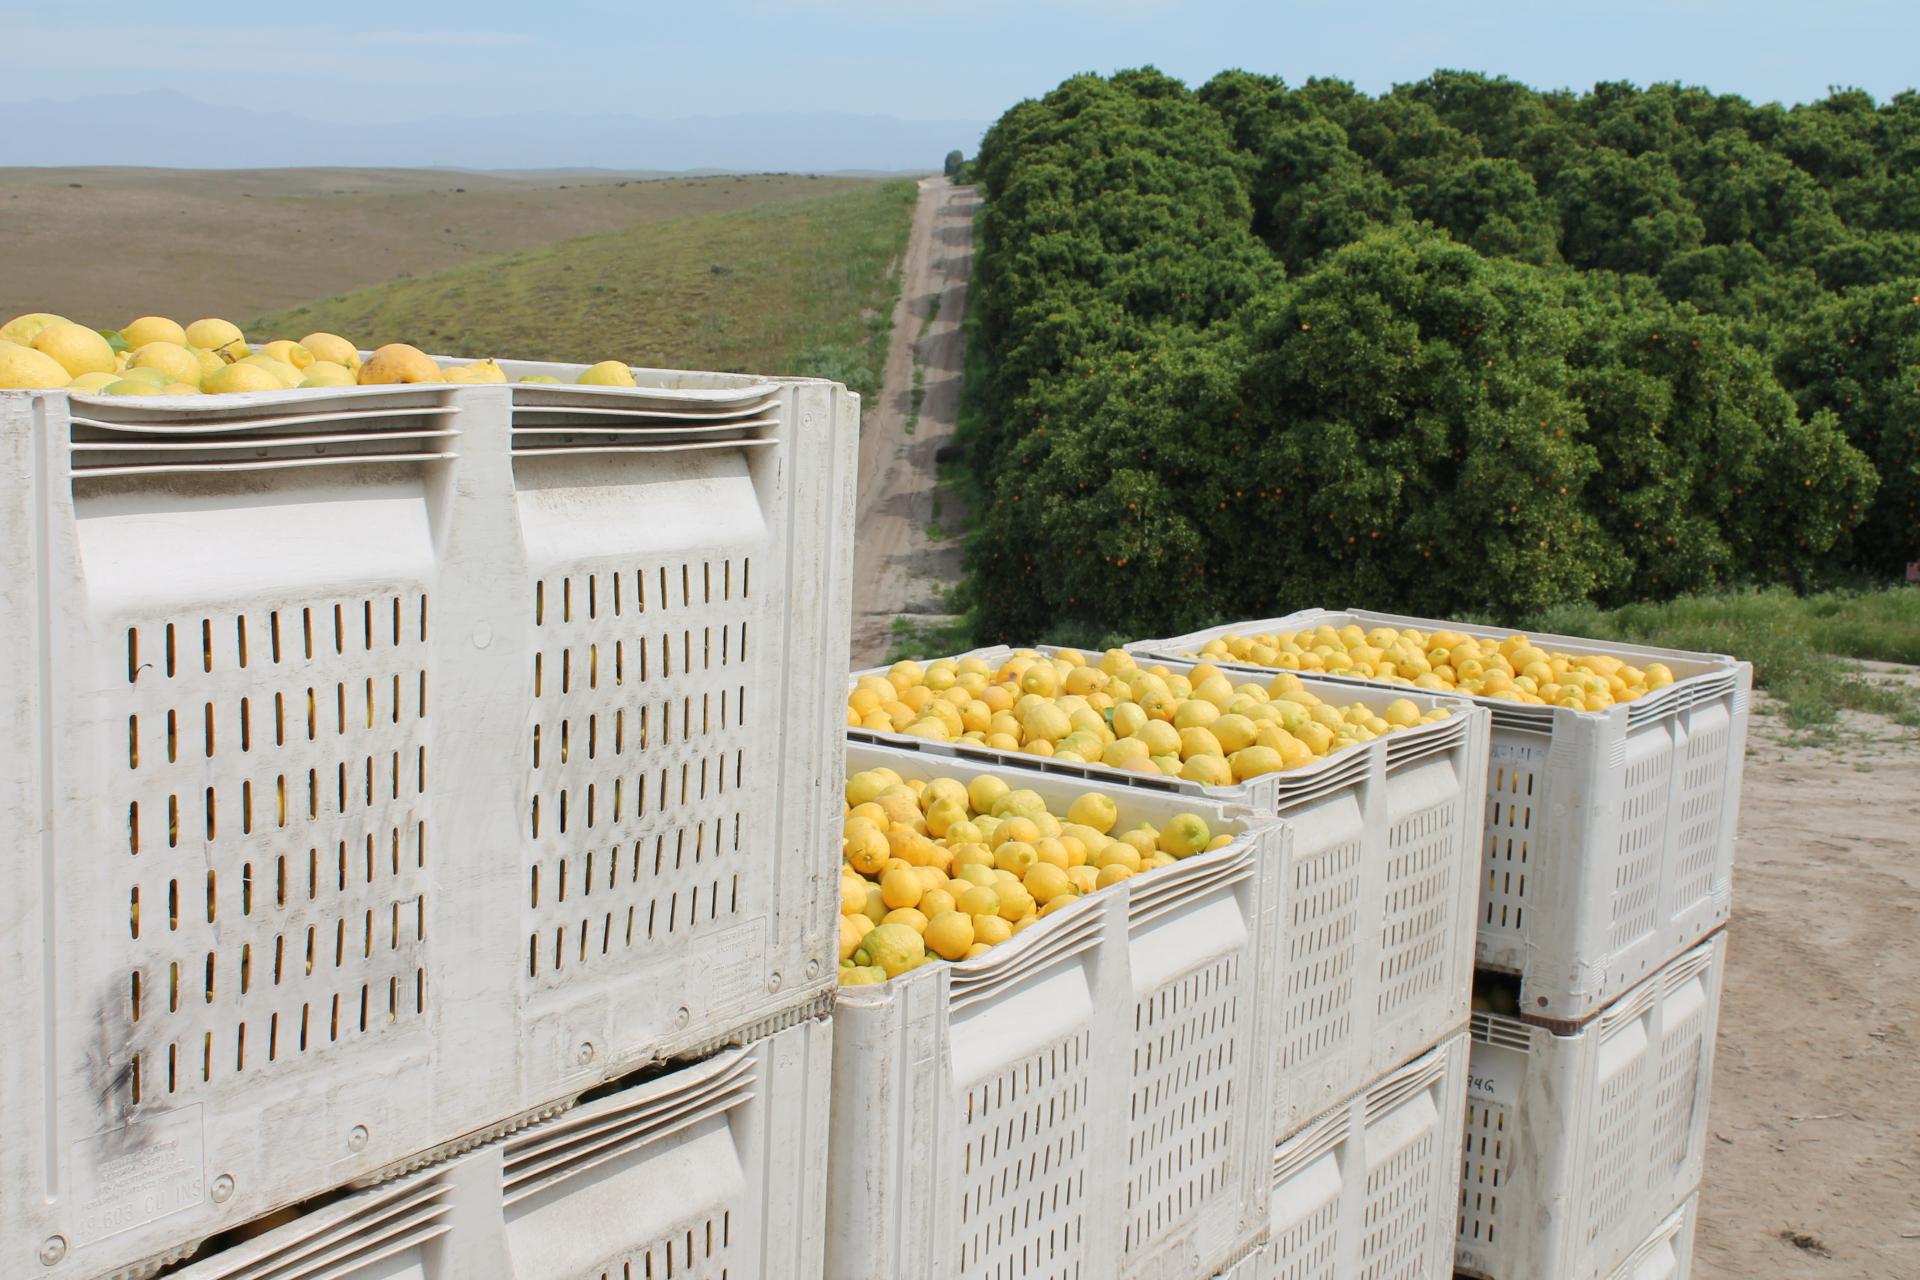 Bins of lemons